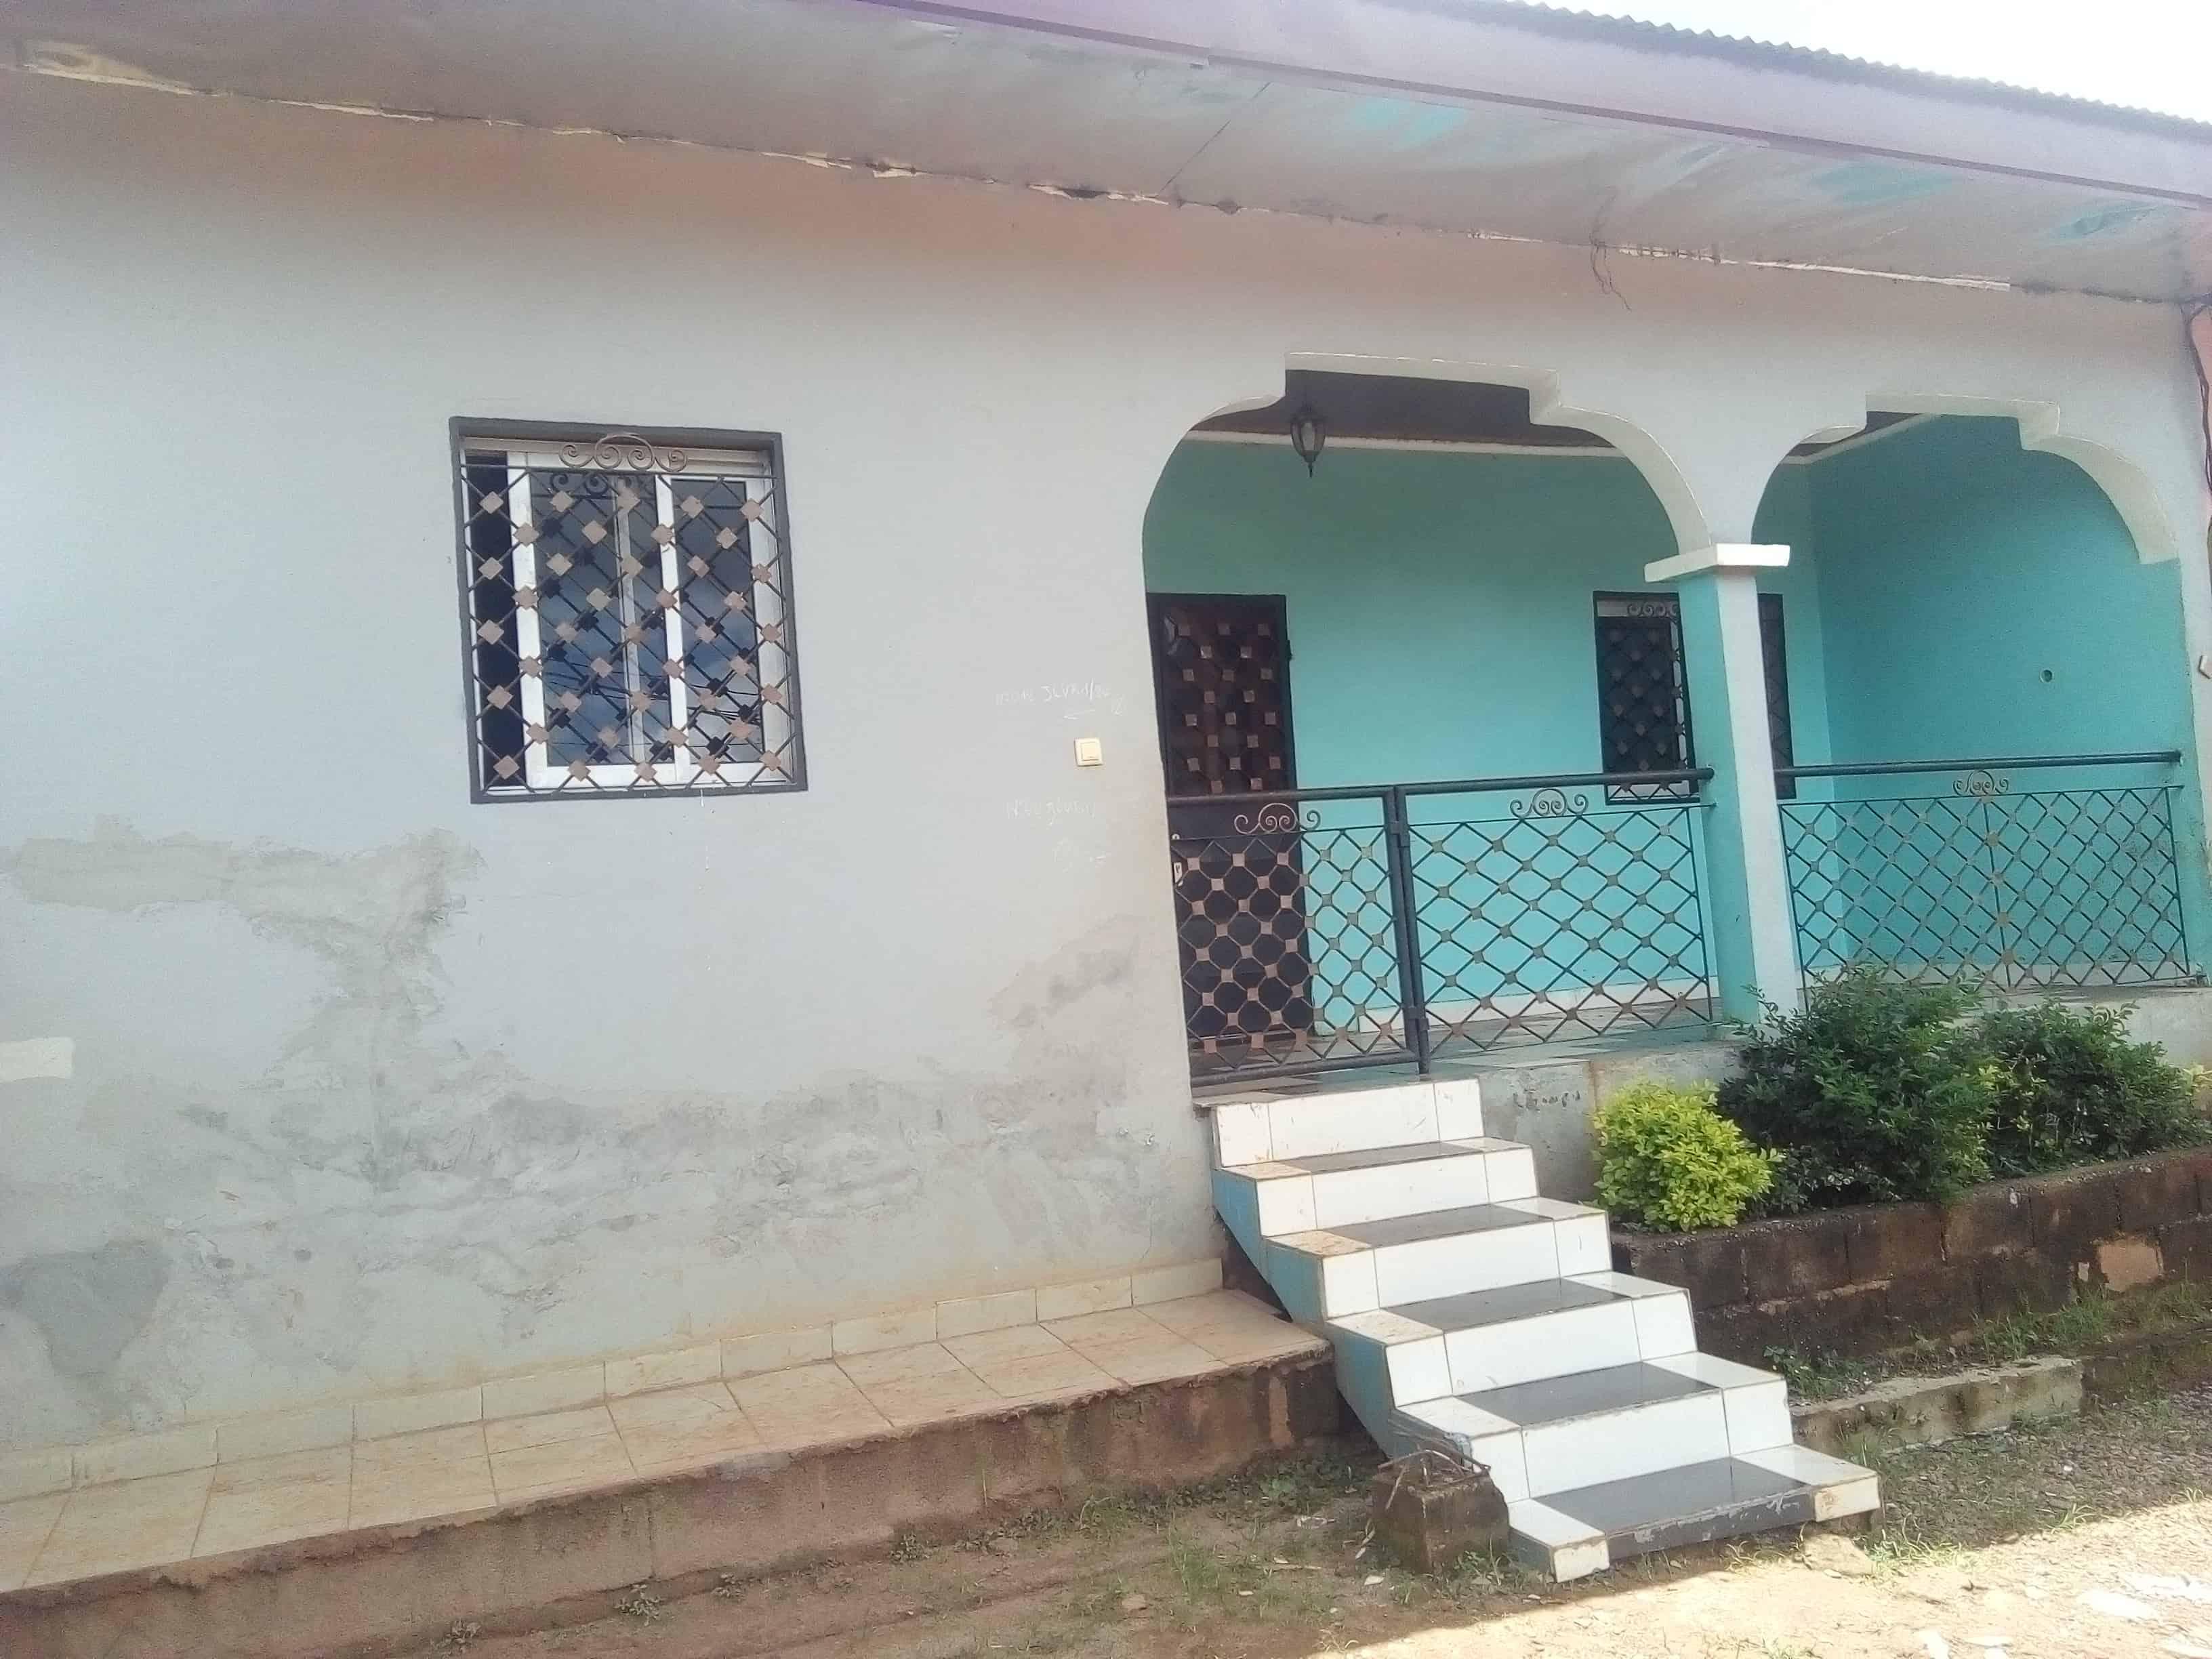 Apartment to rent - Yaoundé, Nkolafeme, Béatitude - 1 living room(s), 3 bedroom(s), 2 bathroom(s) - 90 000 FCFA / month